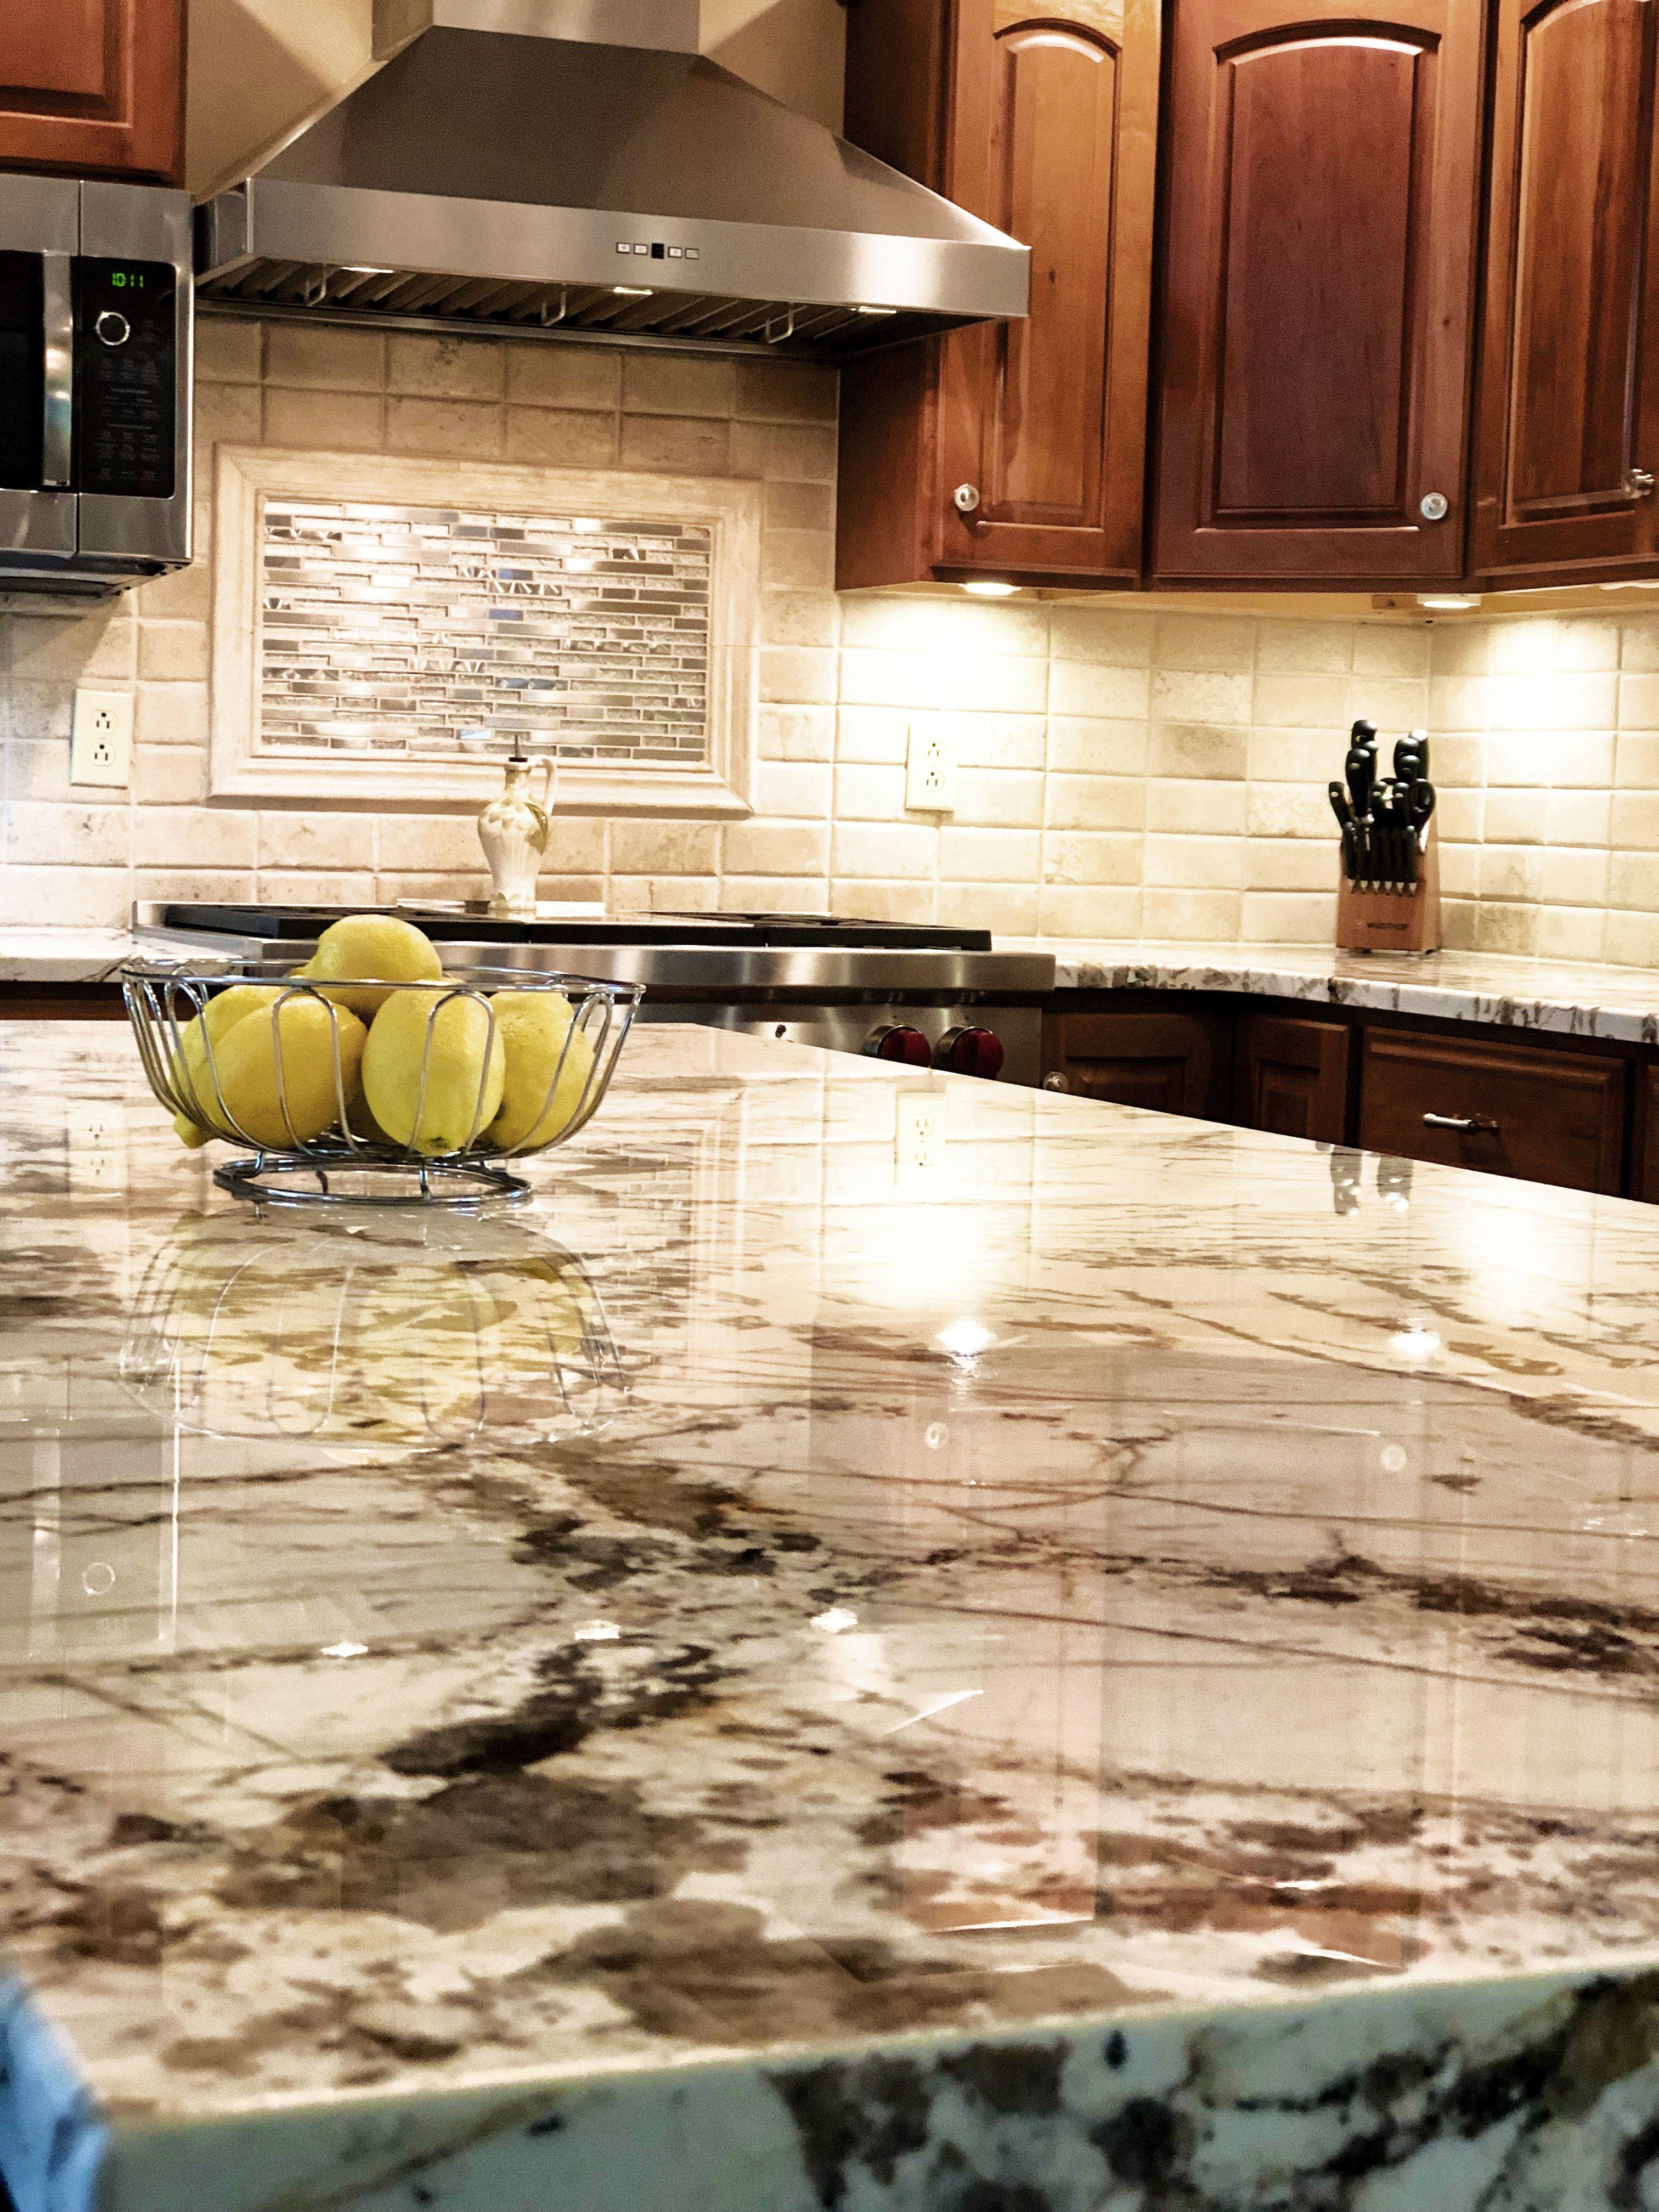 Blanc Du Blanc Granite Images Google Search Kitchen Remodel Kitchen Cabinets Kitchen